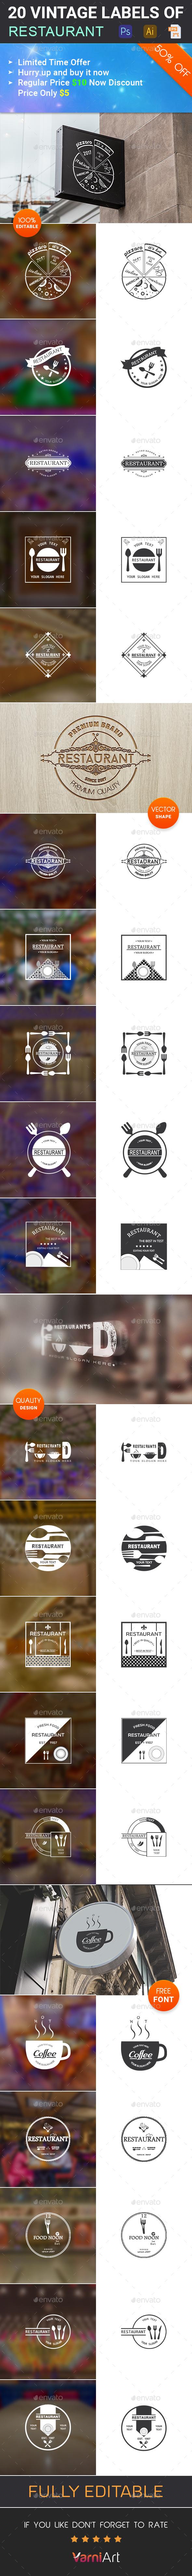 20 Restaurant Vintage Labels - Badges & Stickers Web Elements